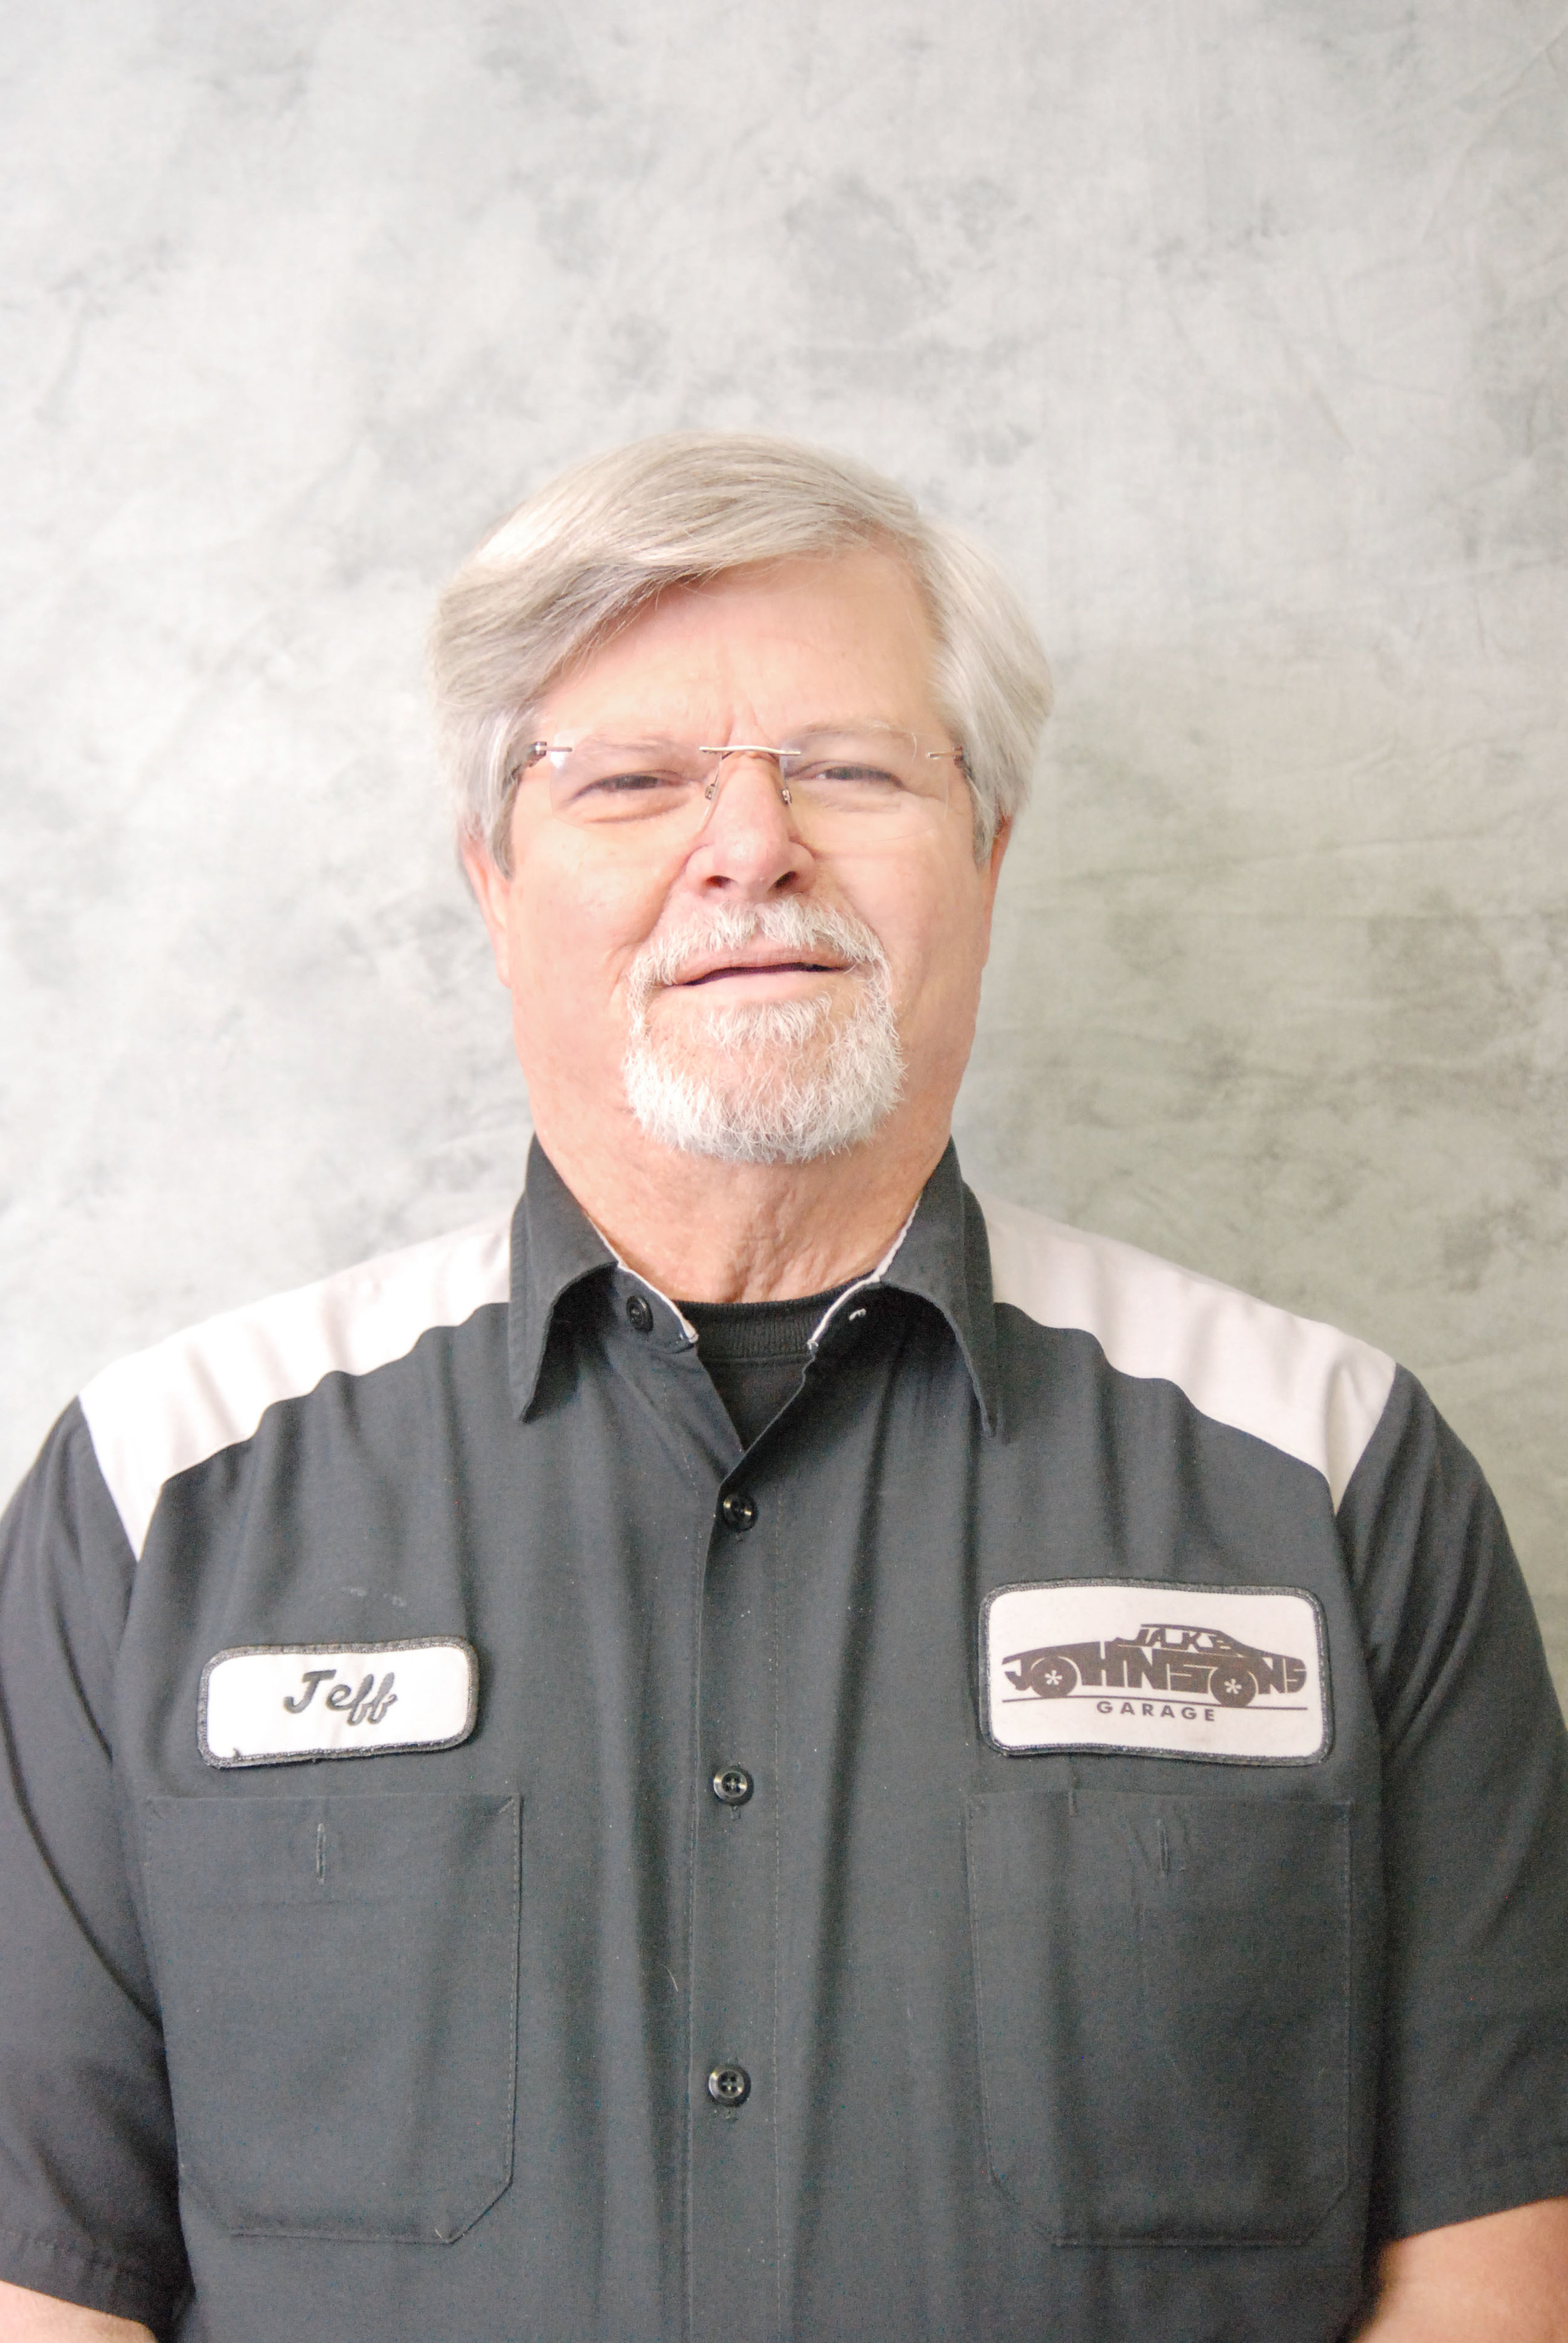 Jeff Johnson - Owner